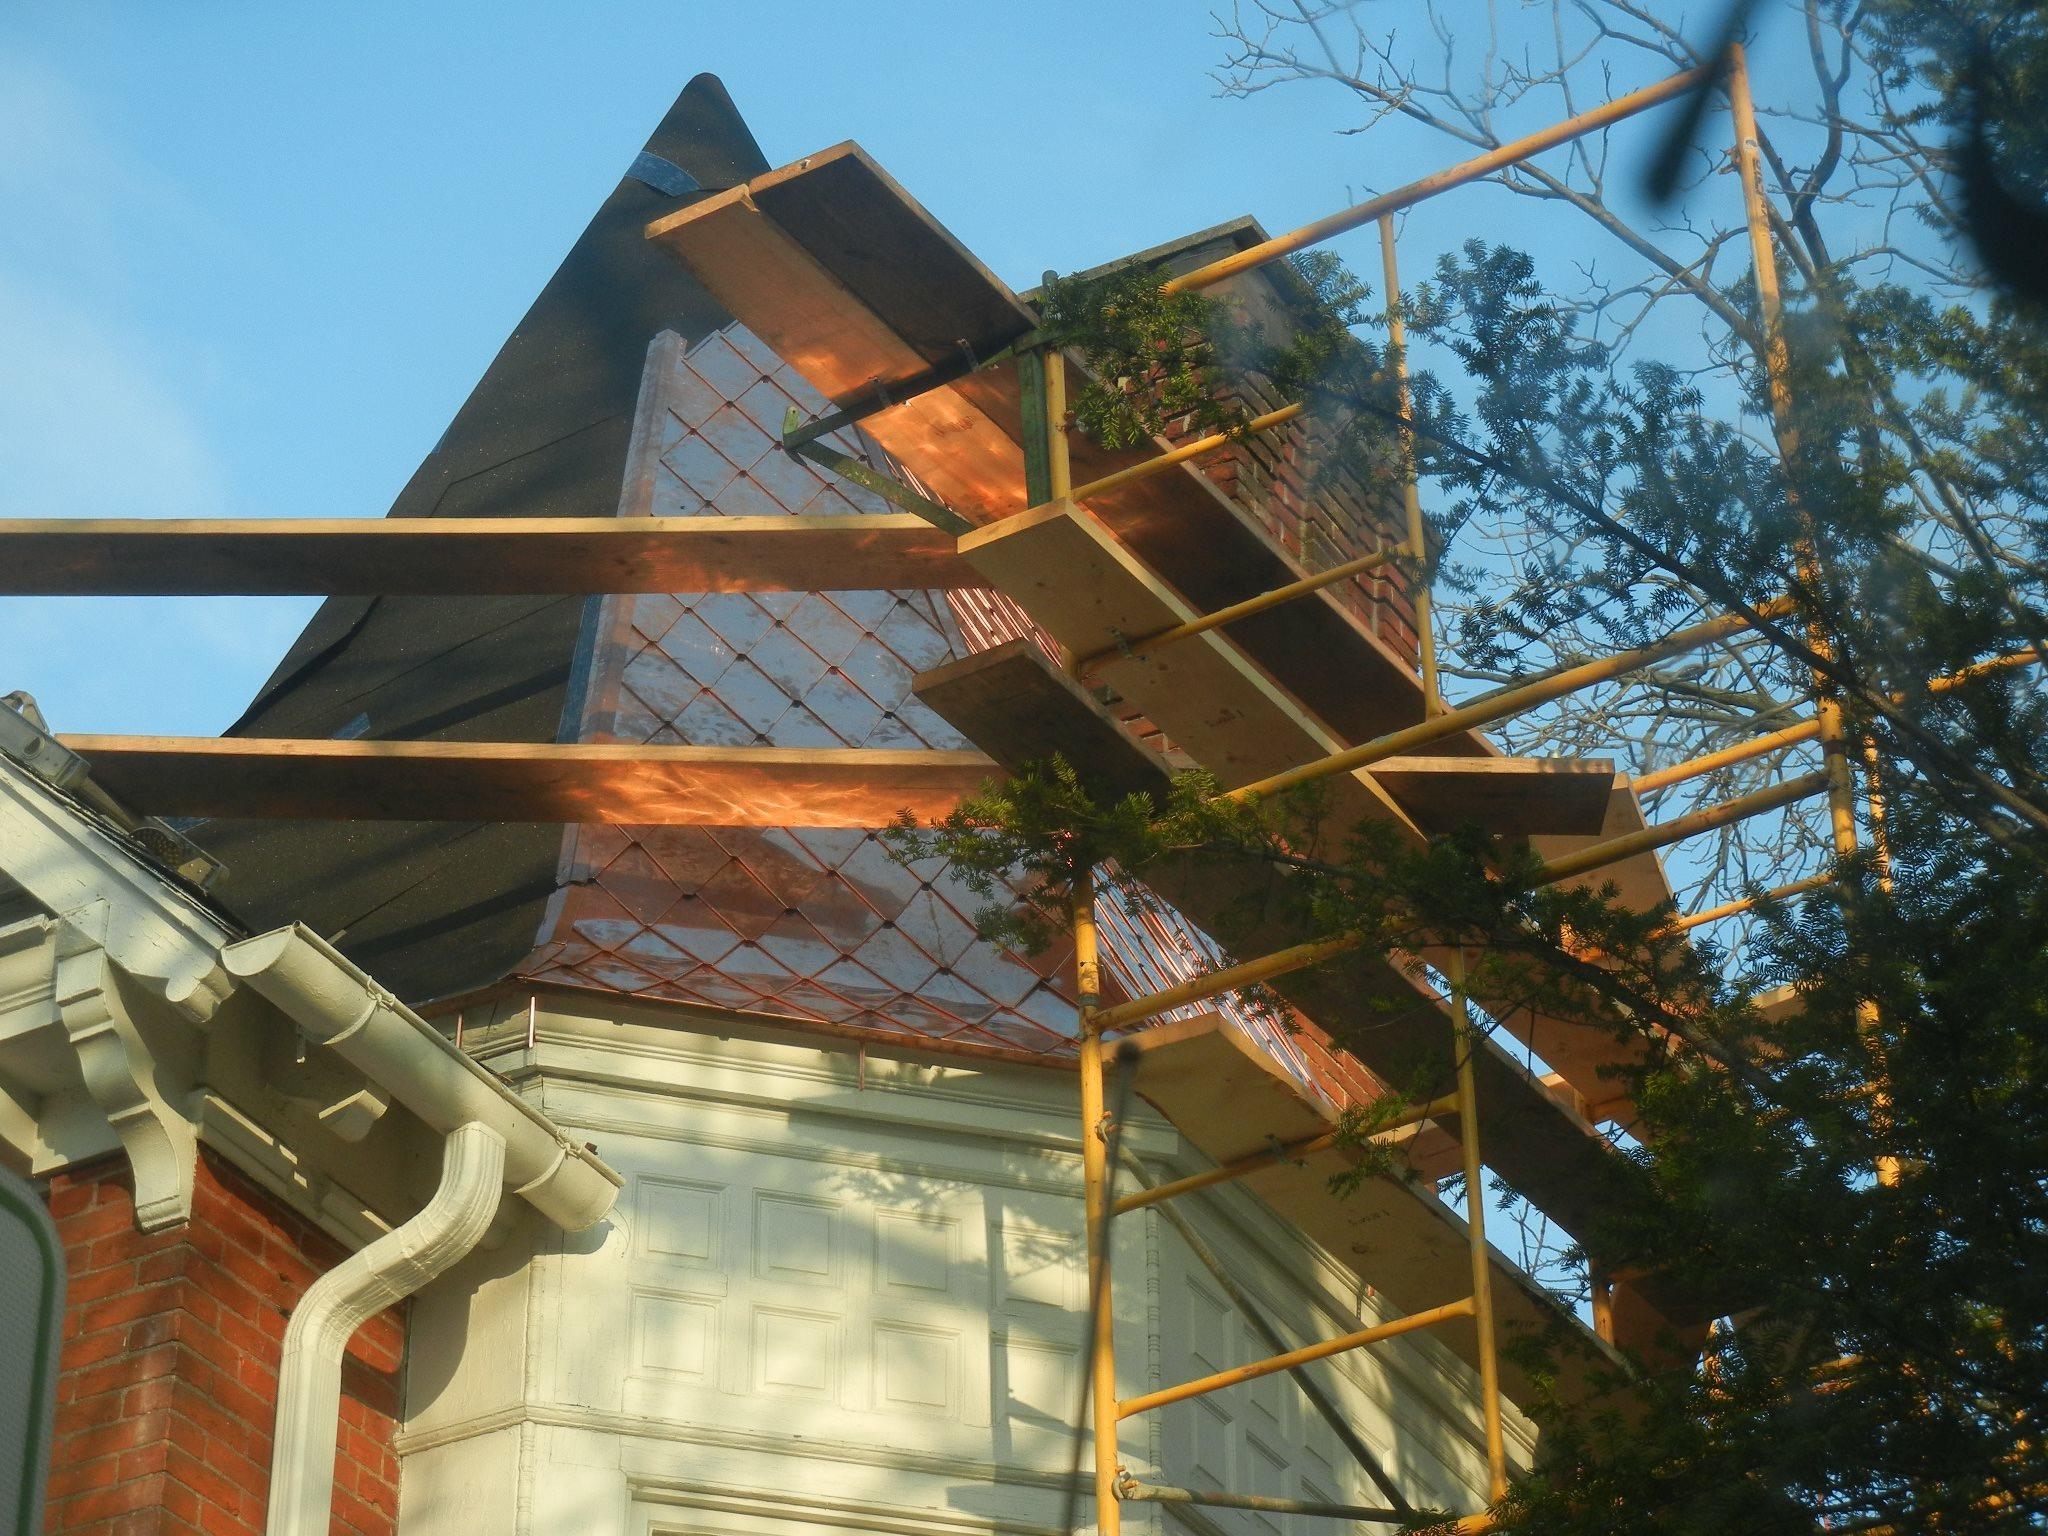 Joey Wildasin Slate Roofing image 32